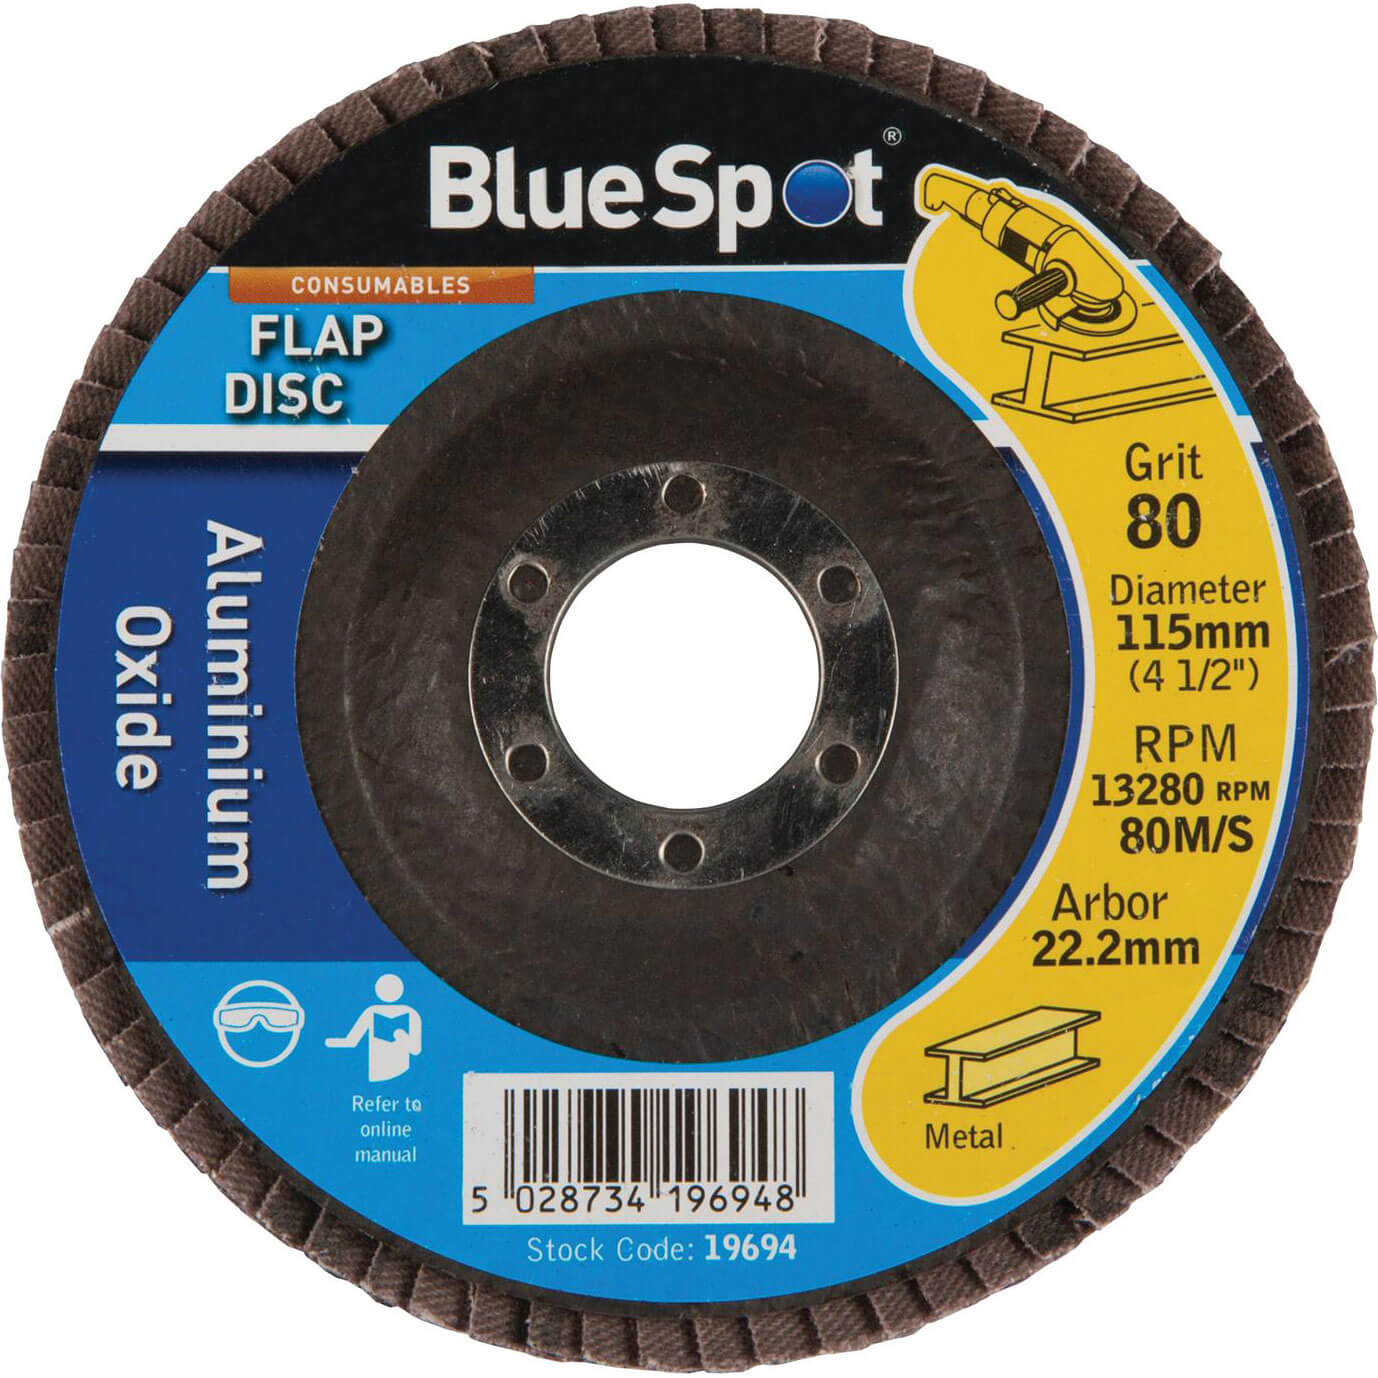 Image of BlueSpot Flap Disc 115mm 115mm 80g